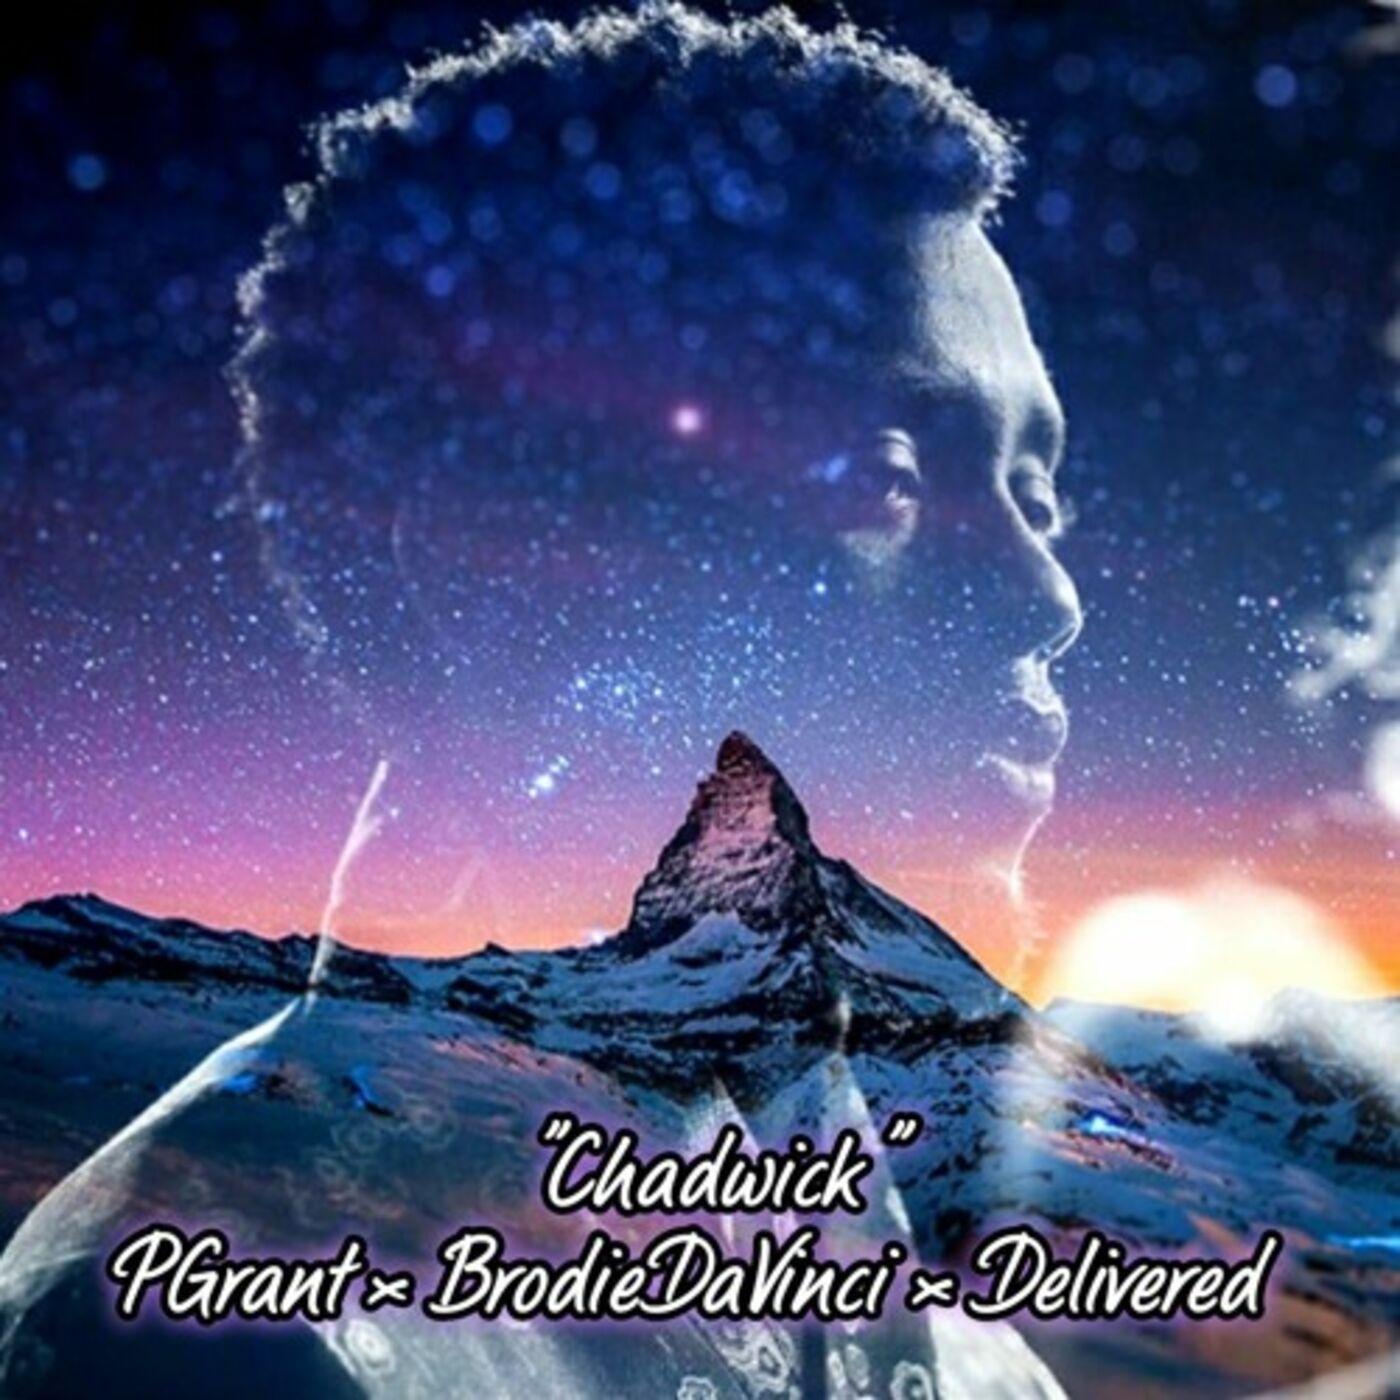 Chadwick - Delivered (ft). BrodieDaVinci & PGrant